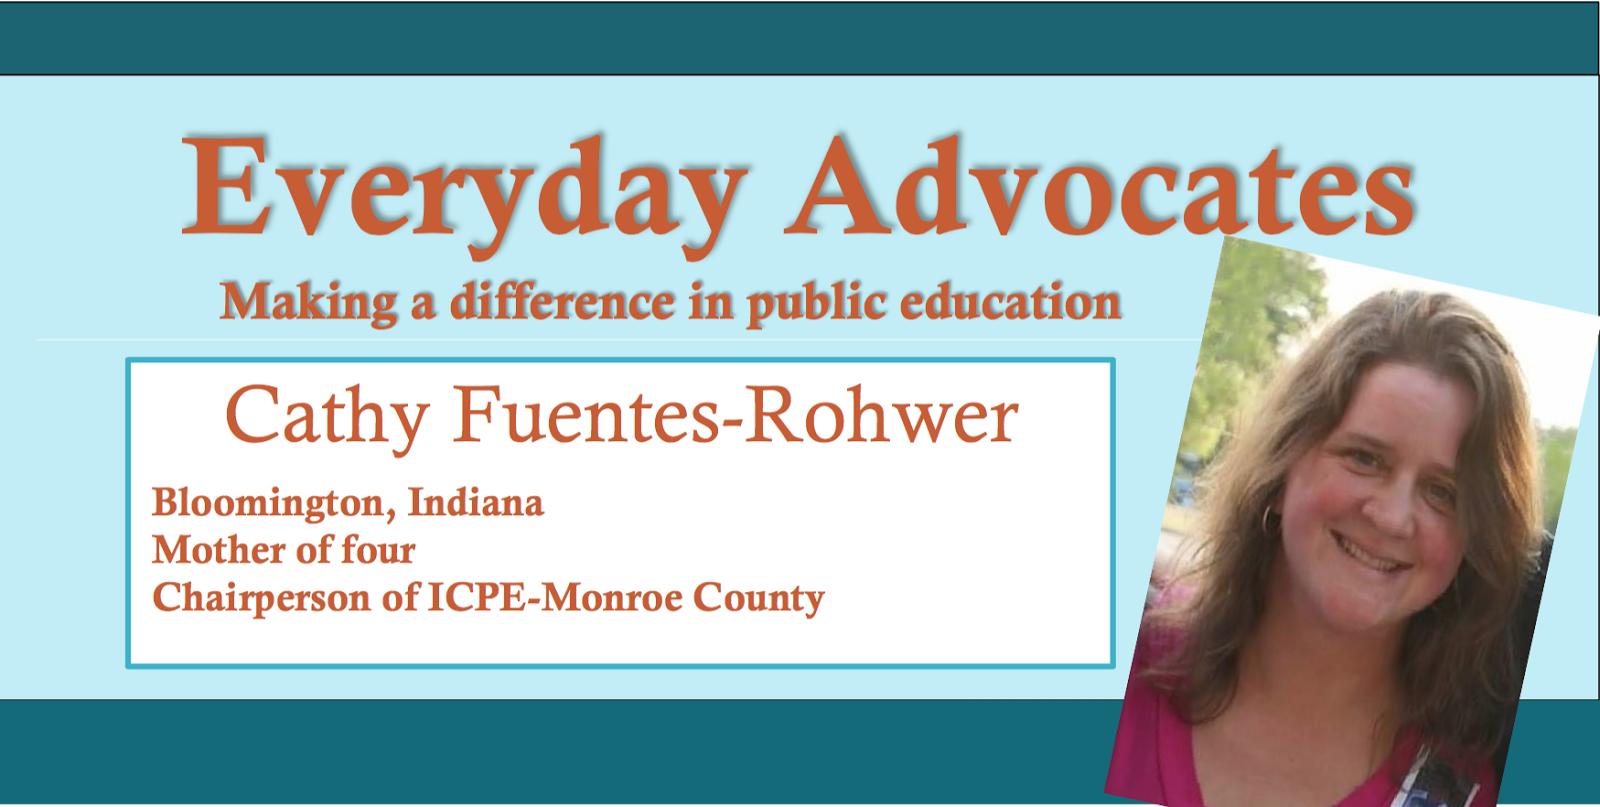 Educational Advocate